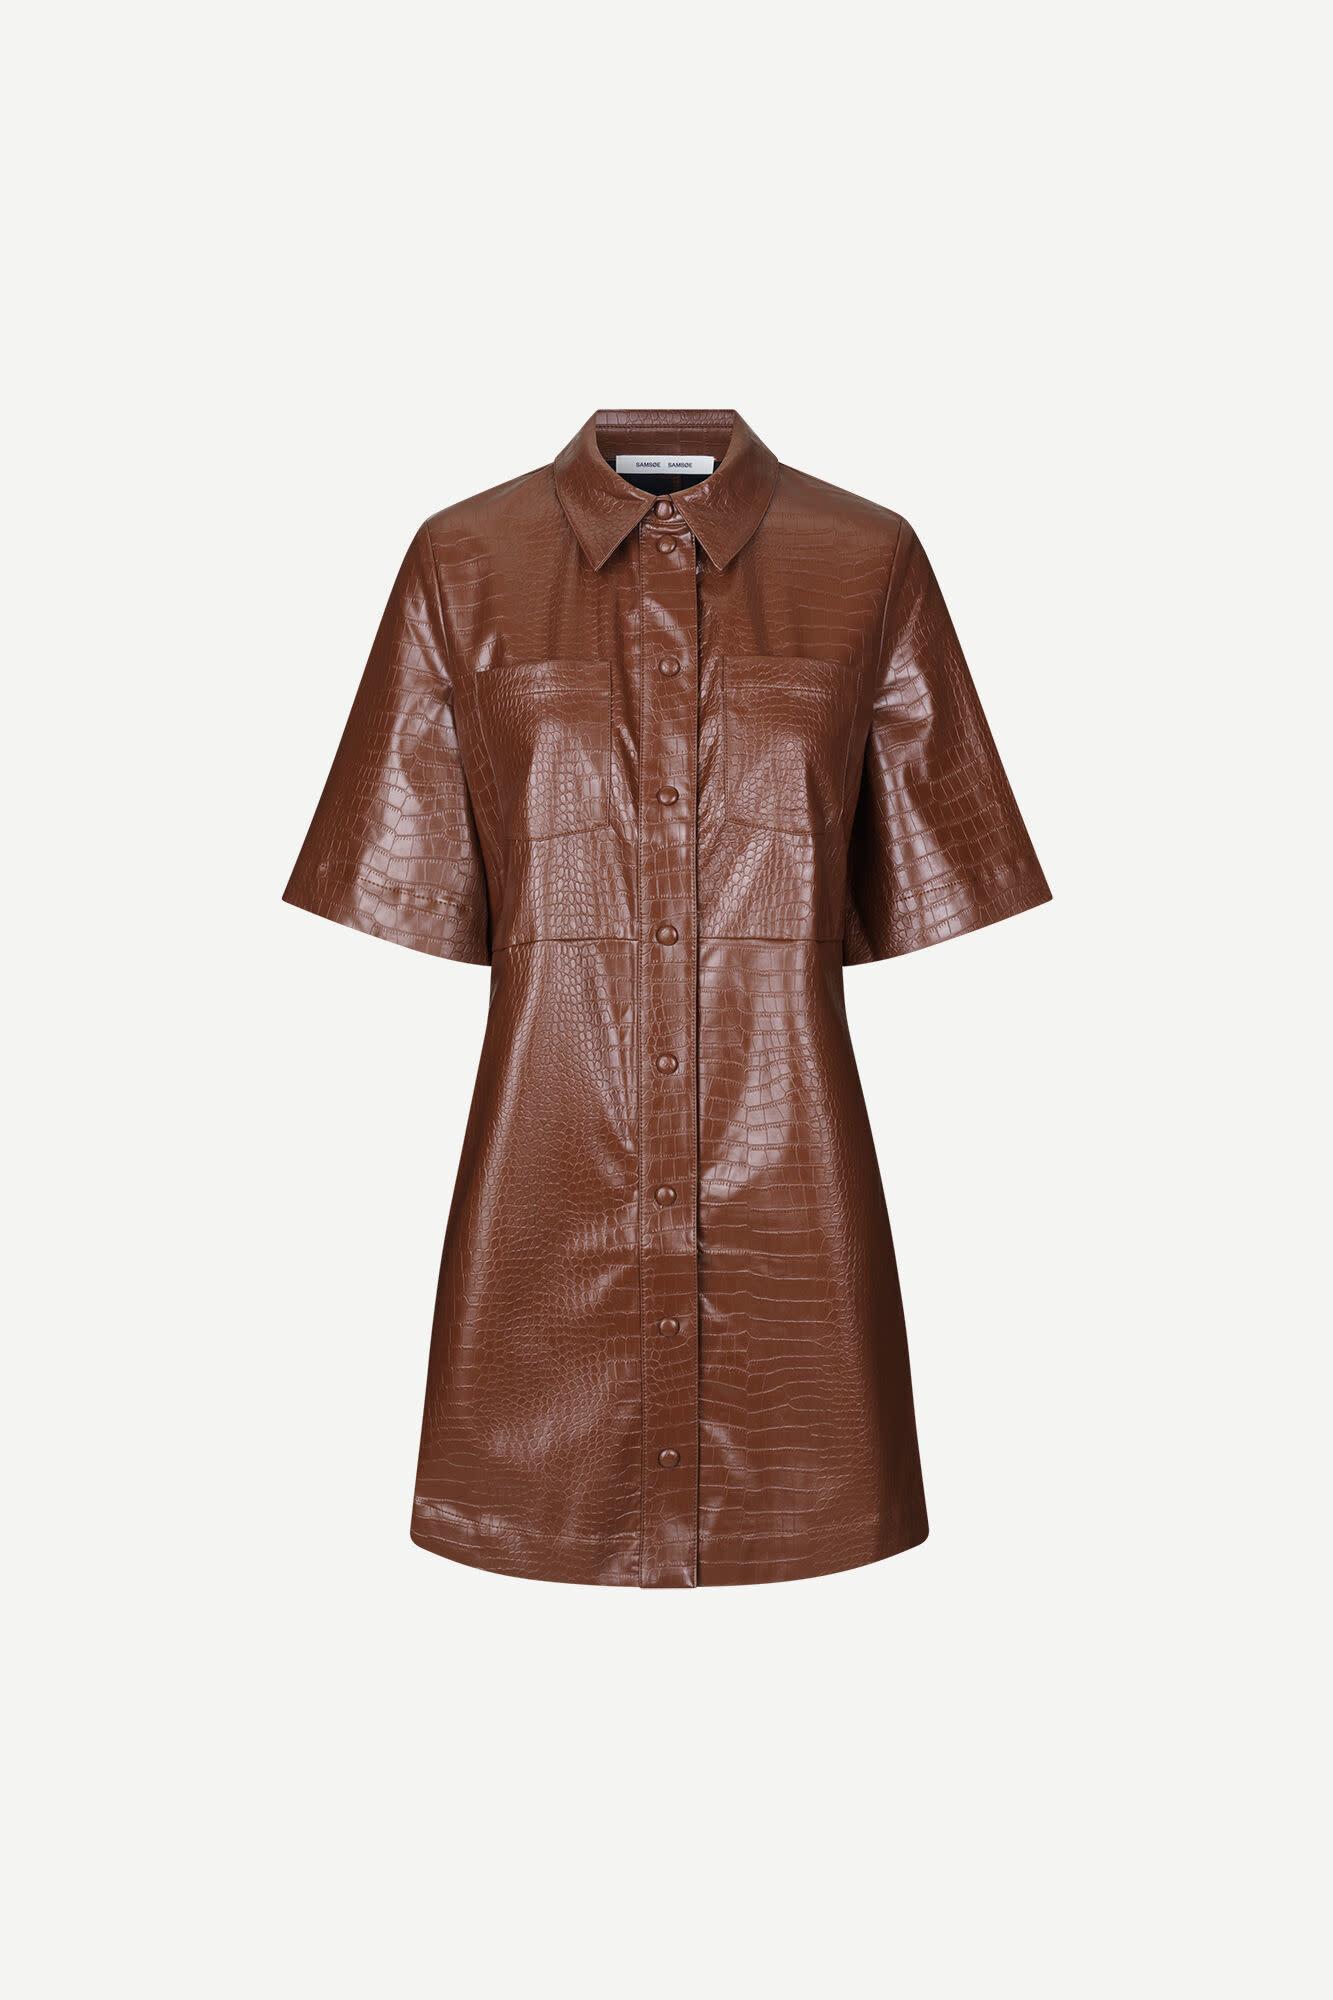 Myla Faux Leather Dress Chocolate Brown-1